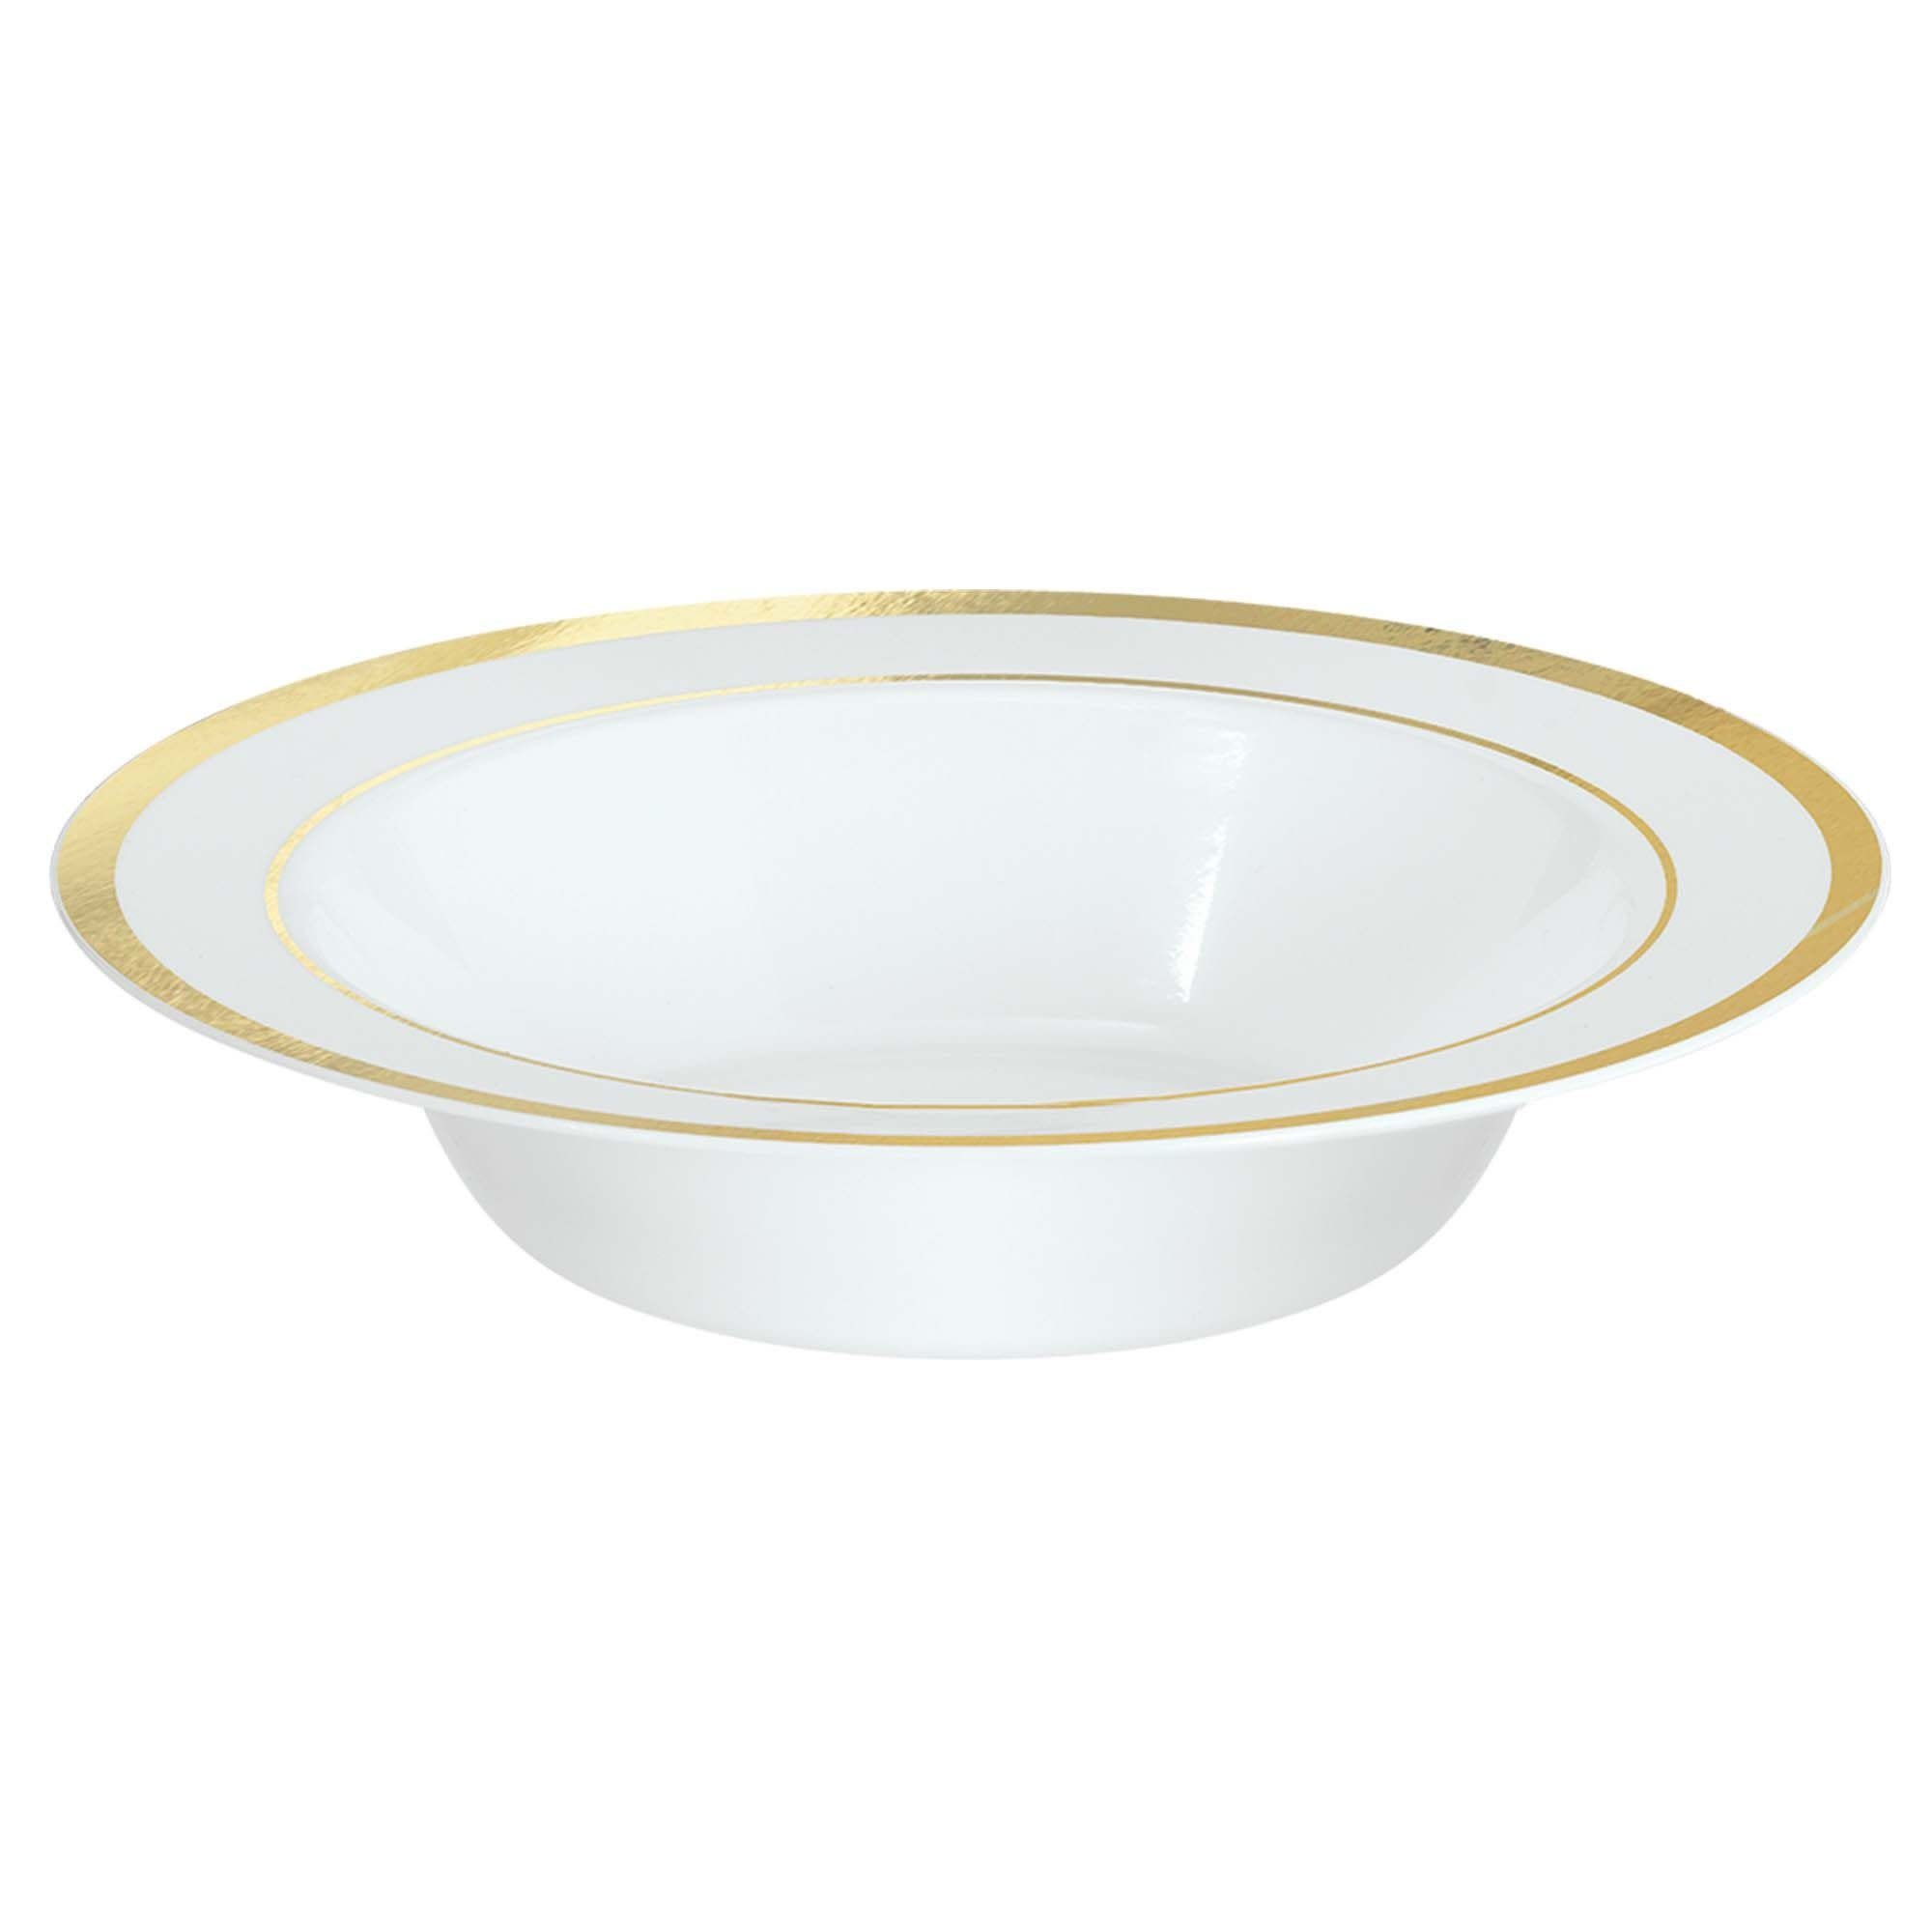 White Premium Plastic Bowls With Gold Trim, 12 Oz.